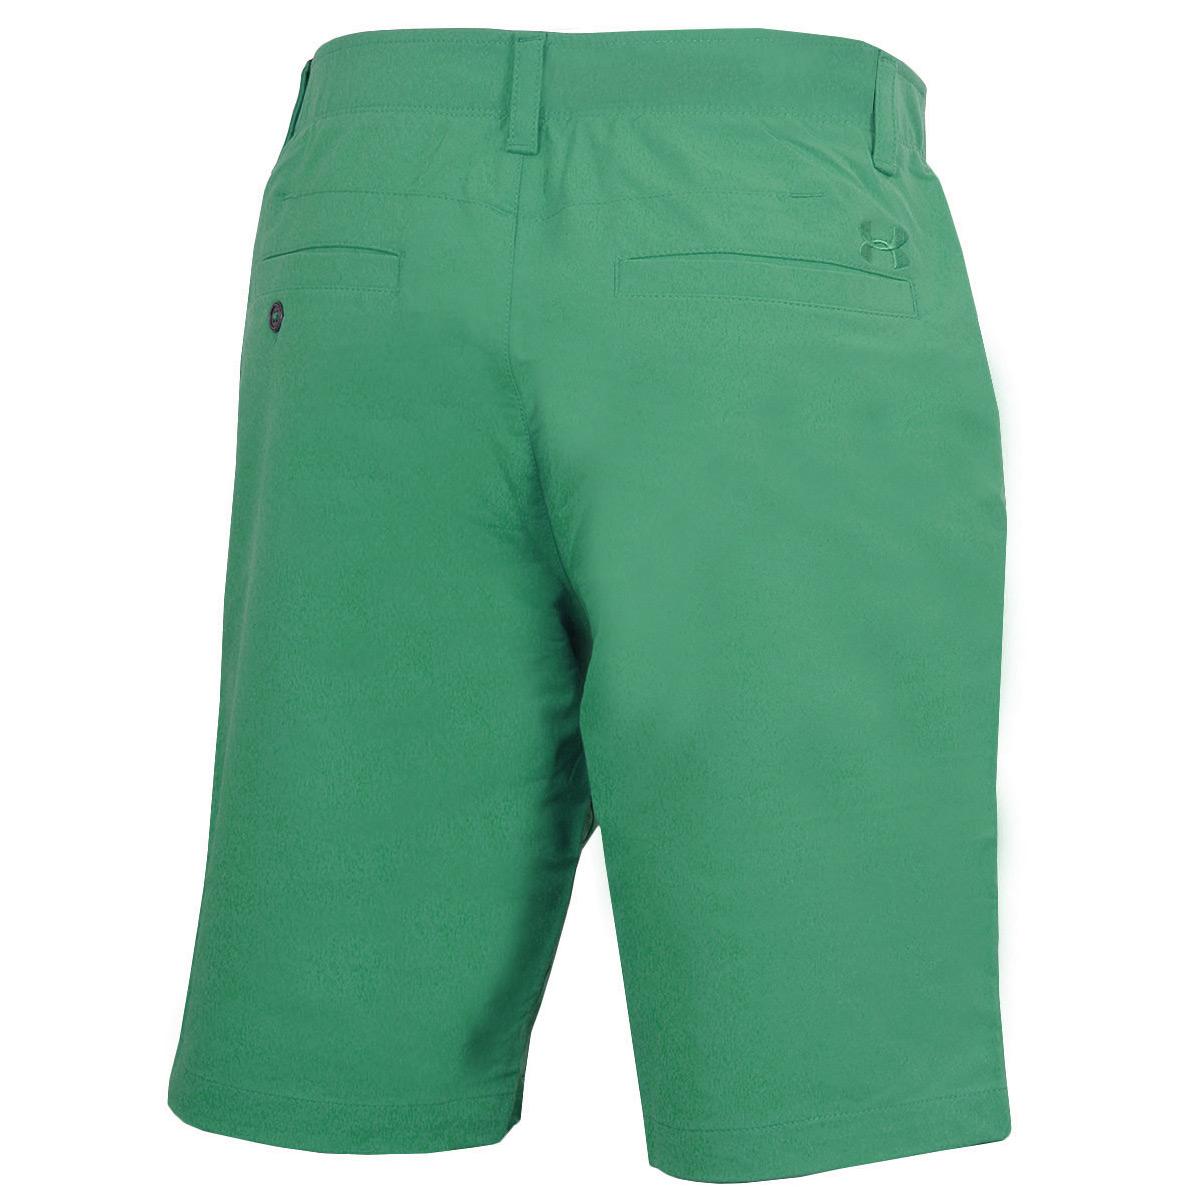 Under-Armour-Mens-UA-Match-Play-Taper-Tech-Performance-Summer-Golf-Shorts thumbnail 5